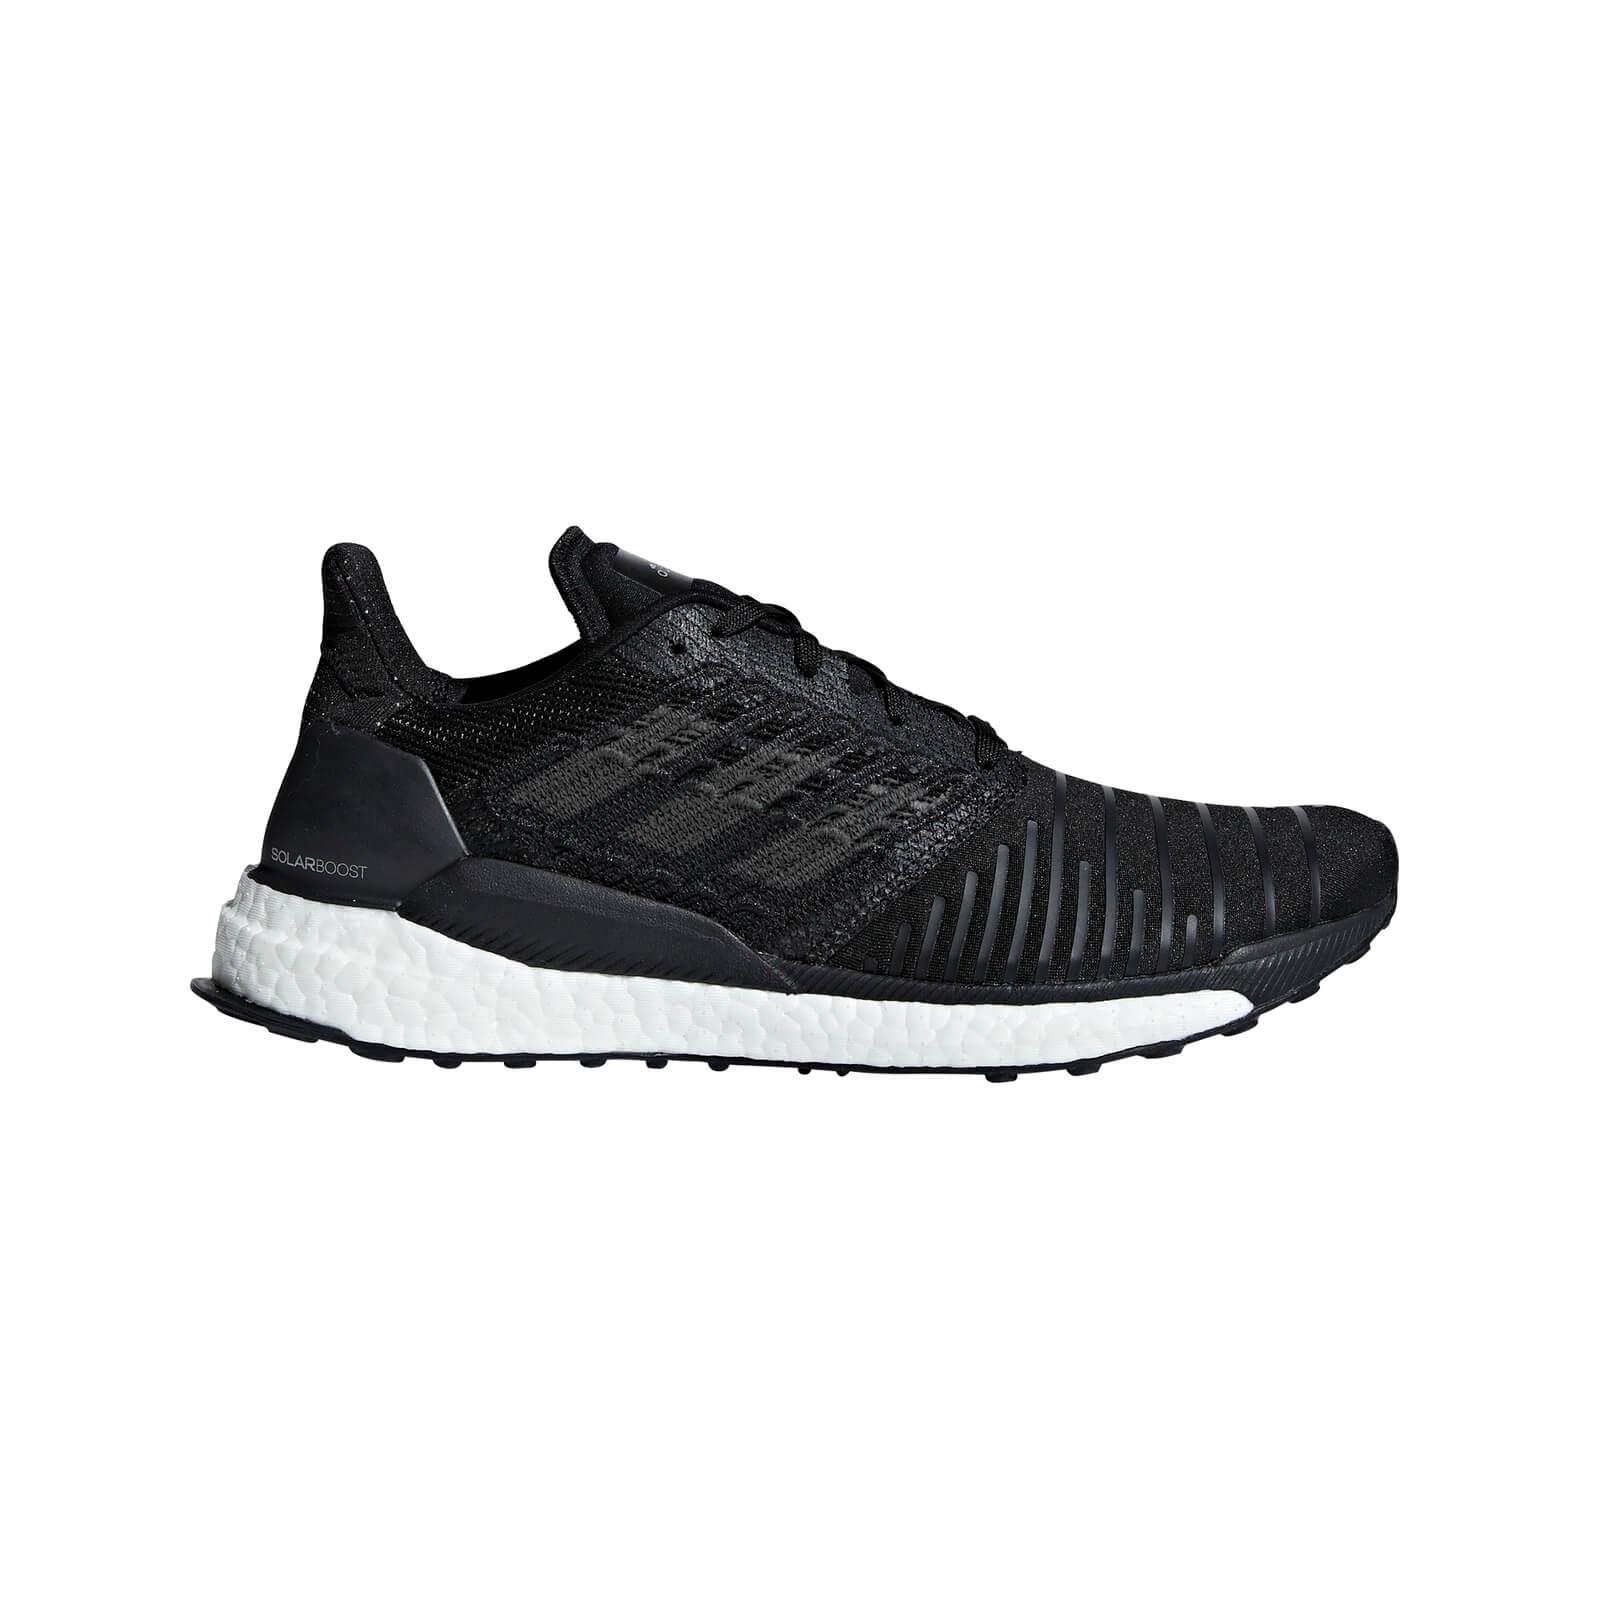 adidas Men's Solar Boost Running Shoes - Black - US 10.5/UK 10 - Black